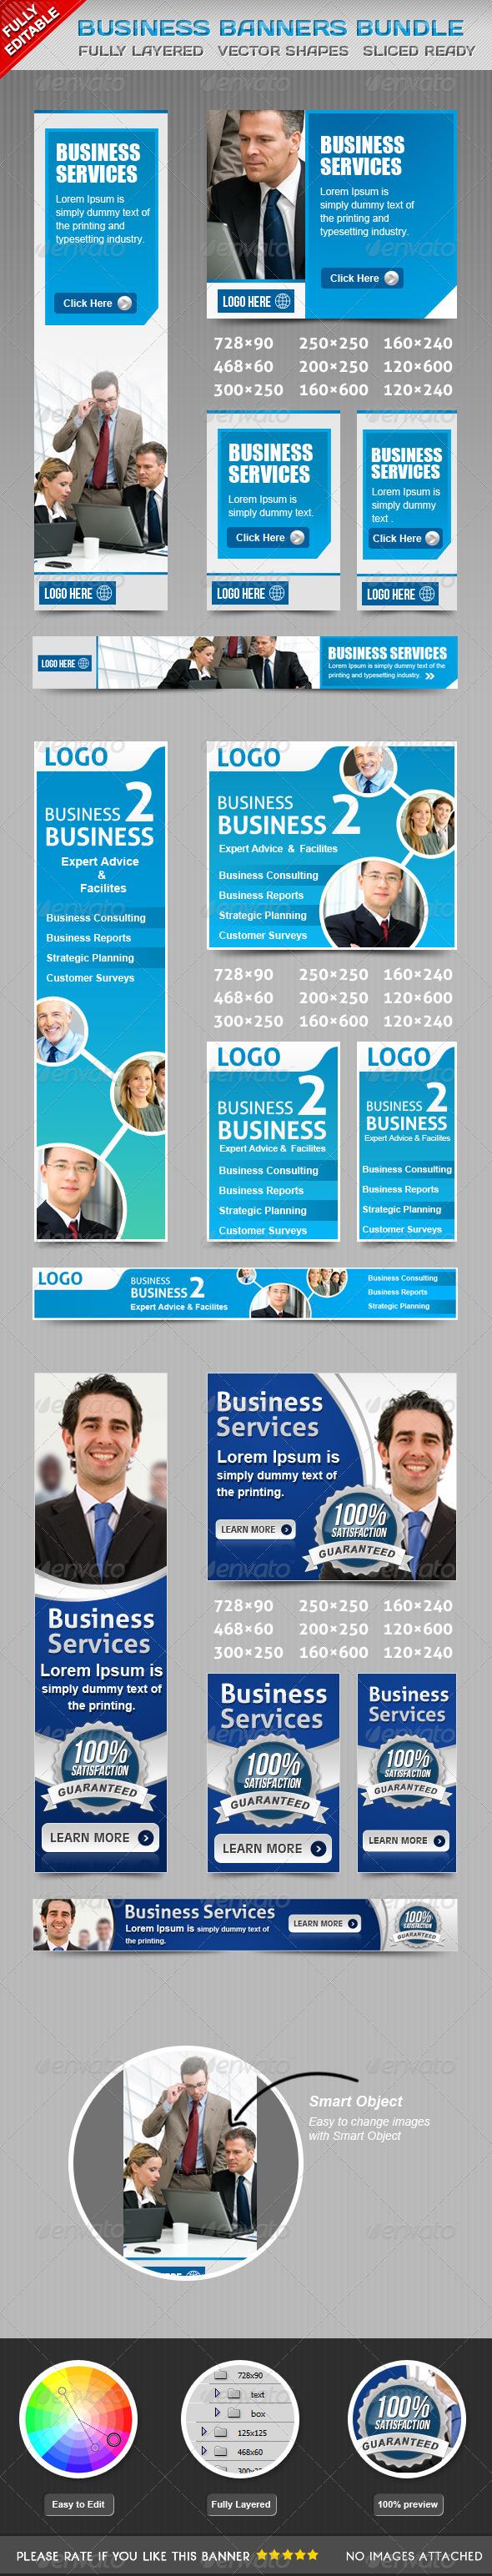 Business Banners Bundle Vol 1